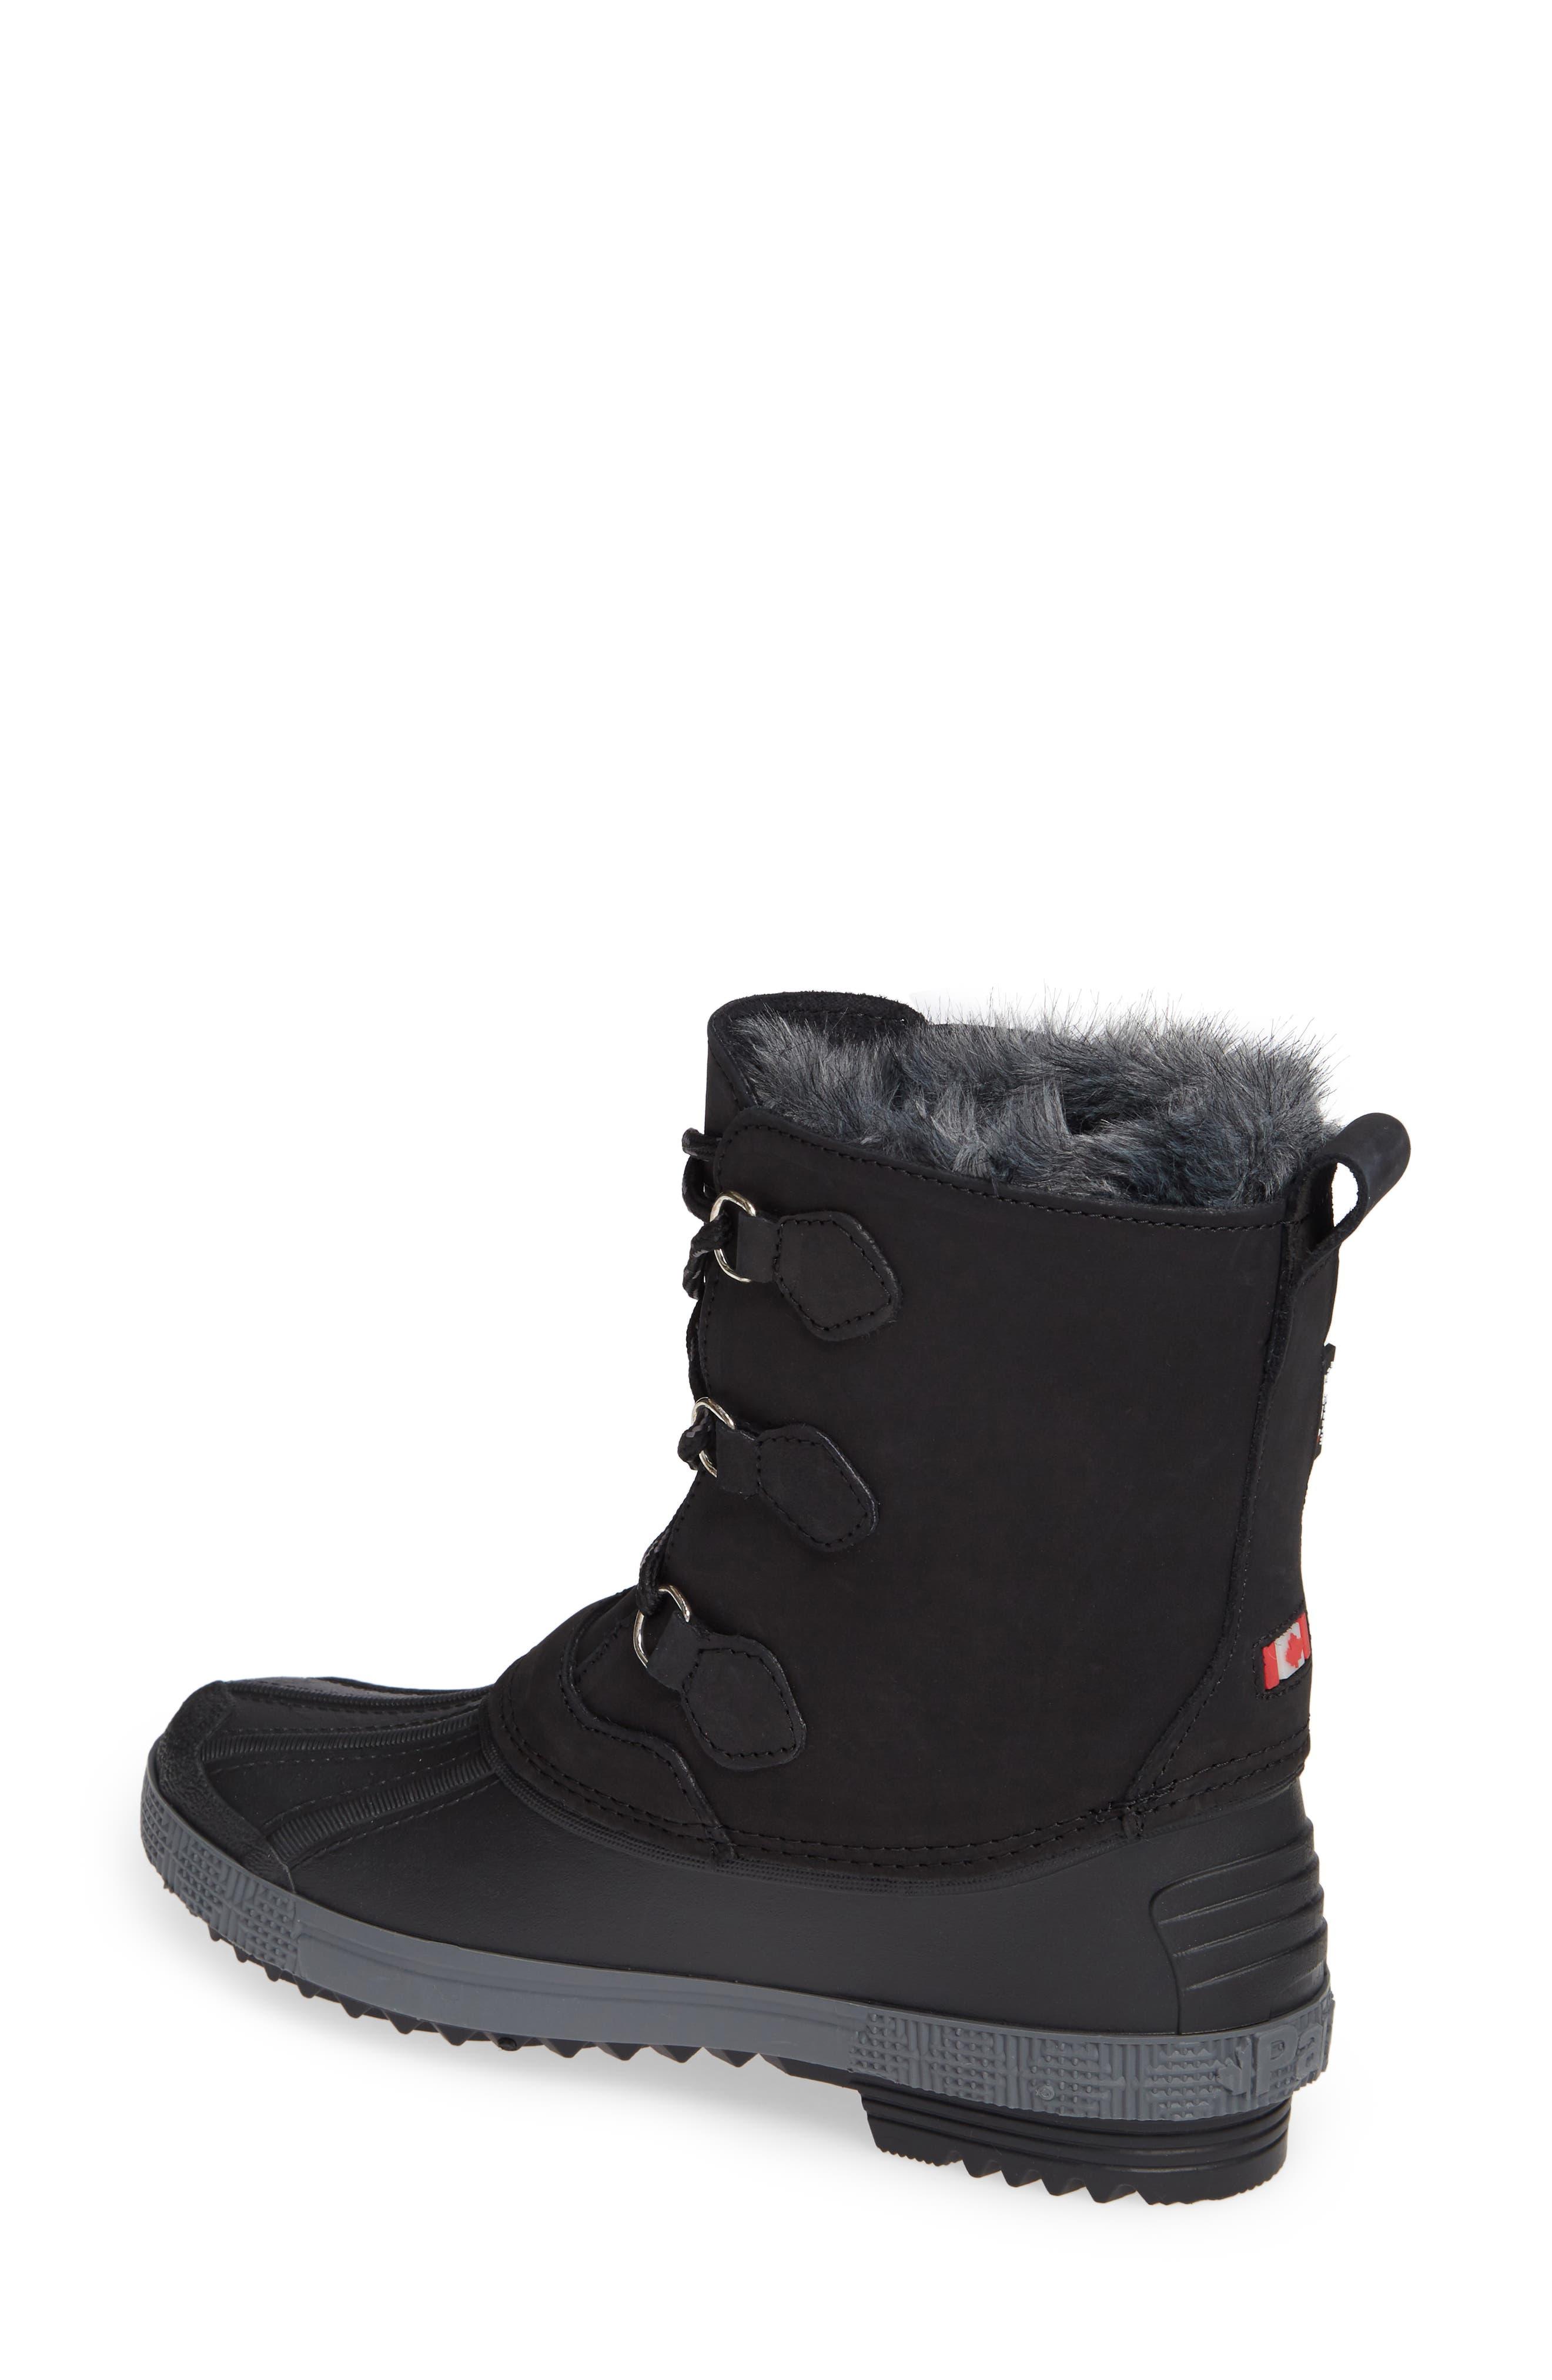 Cali Waterproof Insulated Boot,                             Alternate thumbnail 2, color,                             BROWN/ BLACK